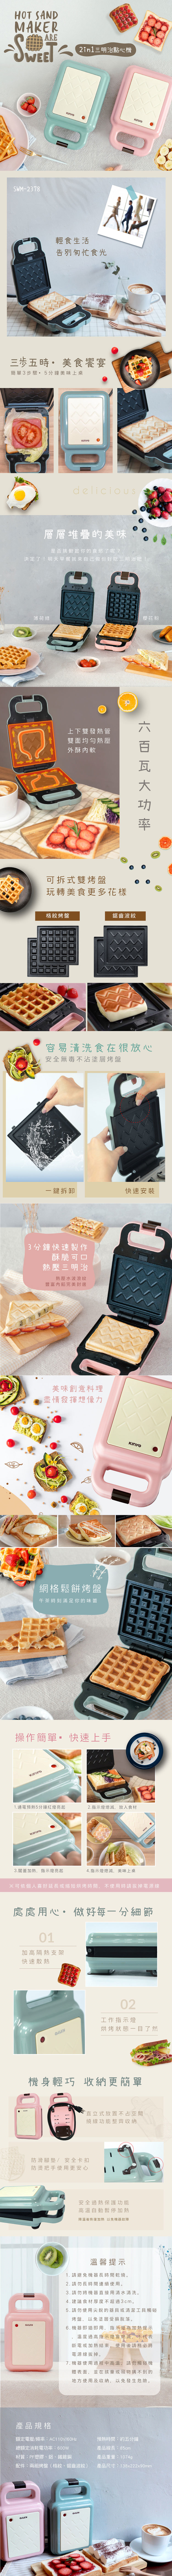 KINYO 多功能三明治機/點心機/鬆餅機 (粉紅/粉藍) SWM-2378